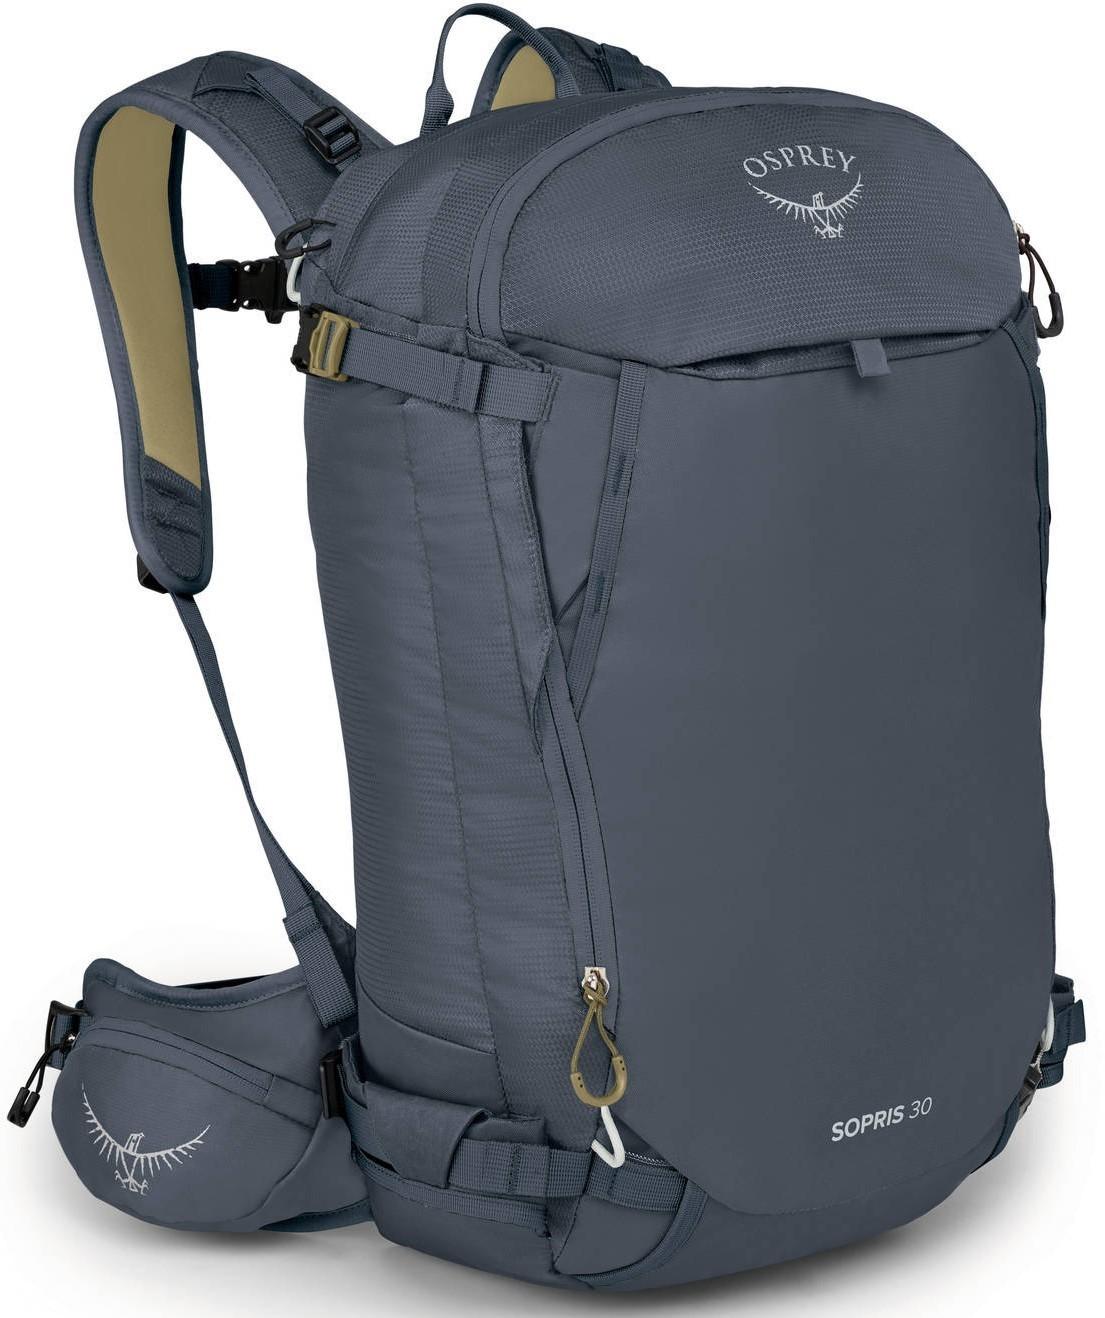 Рюкзаки для сноуборда Рюкзак Osprey Sopris 30 Tungsten Grey Sopris_30_F20_Side_Tungsten_Grey_web.jpg